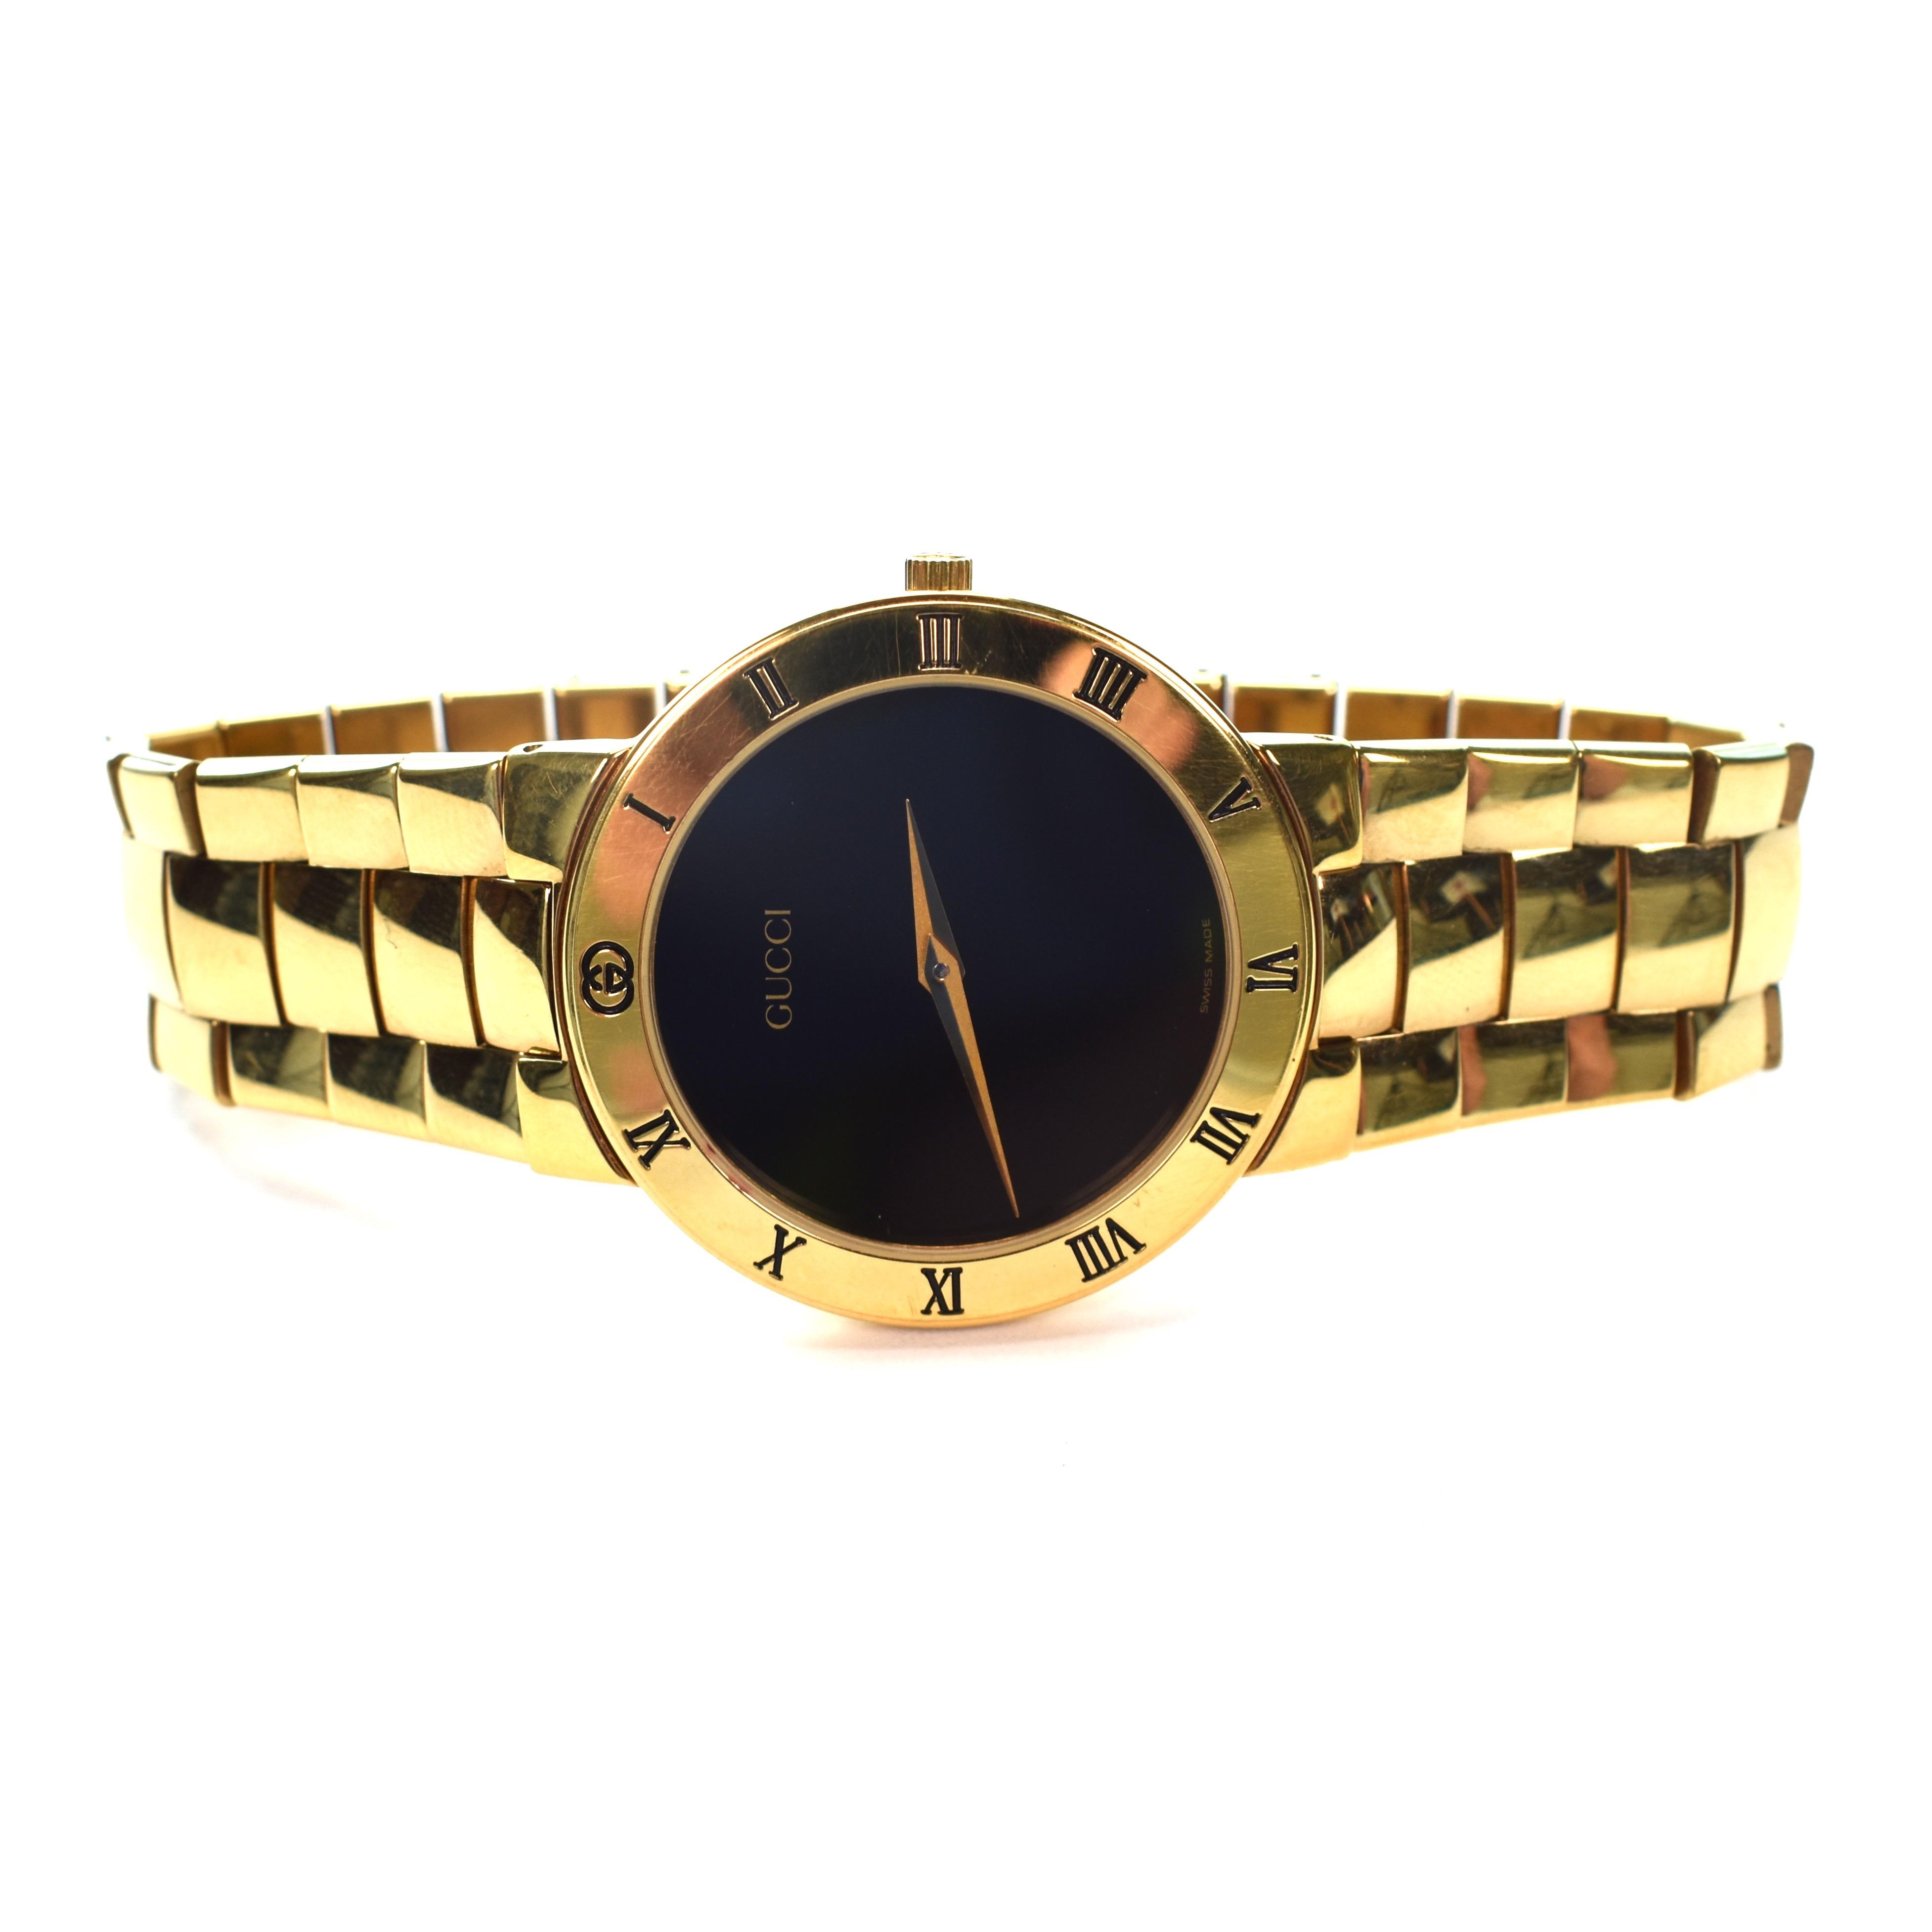 9f418f93fec Gucci ×. 90s Pulp Fiction 3300M Gold Watch